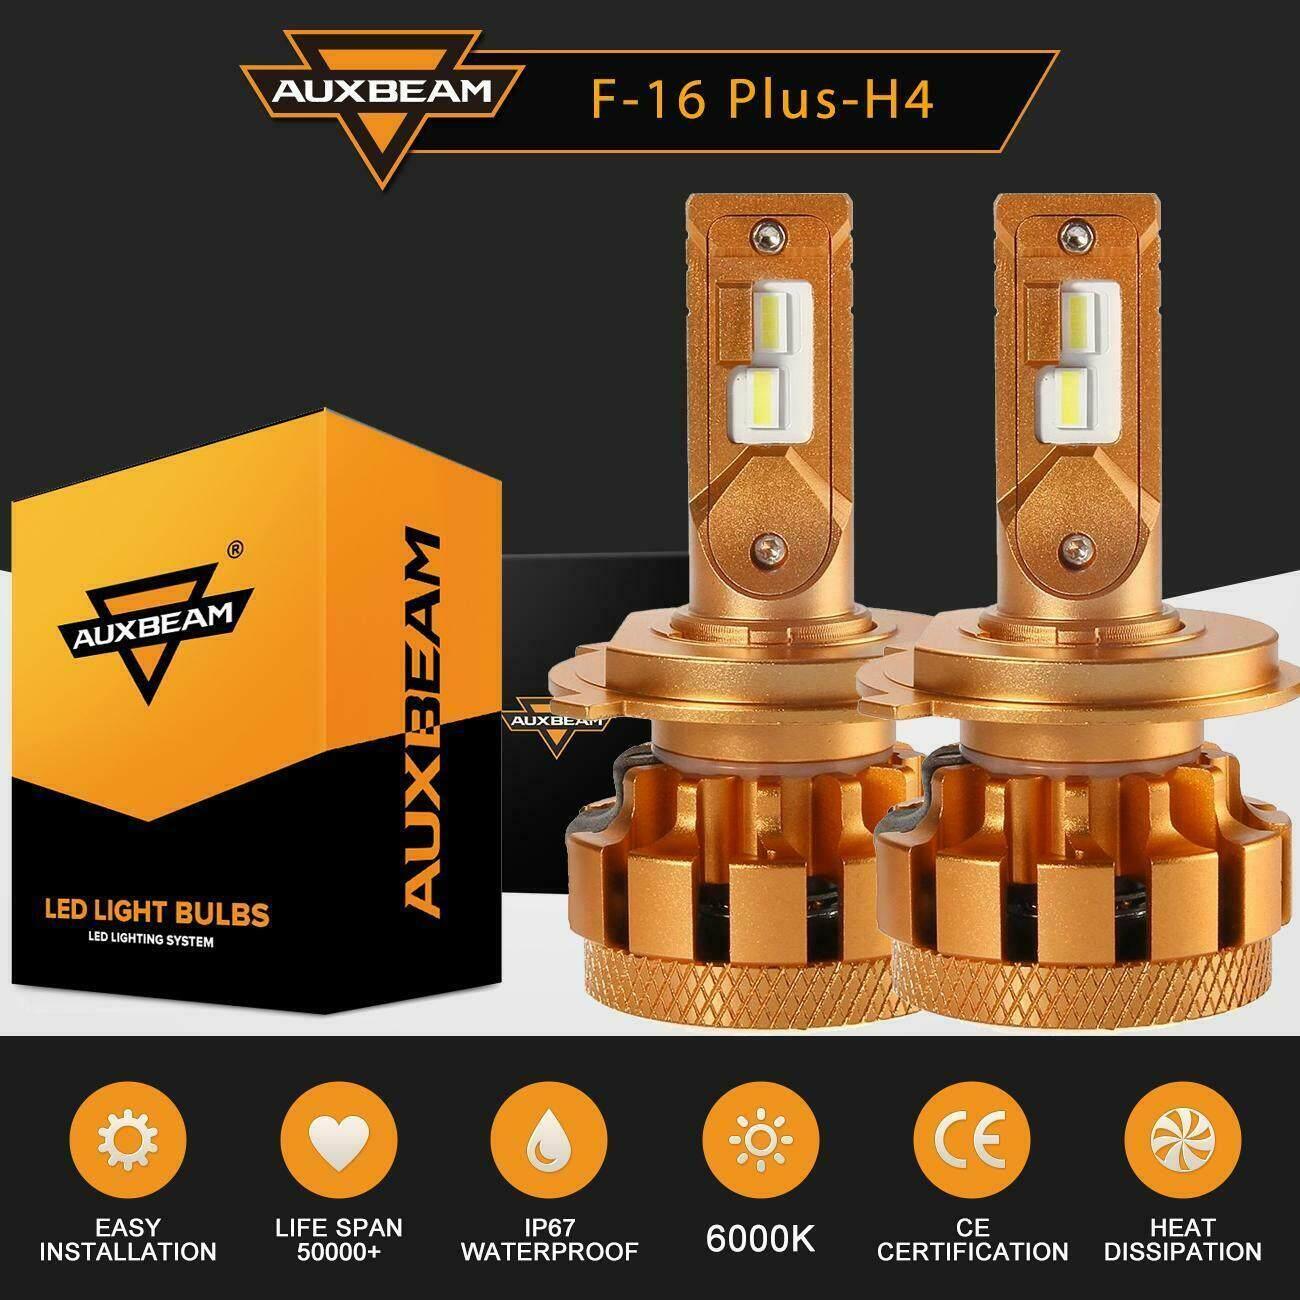 AUXBEAM T1 SERIES H4 9003 LED Headlight Hi-Low Bulbs 70W 8000LM White 6500K MINI